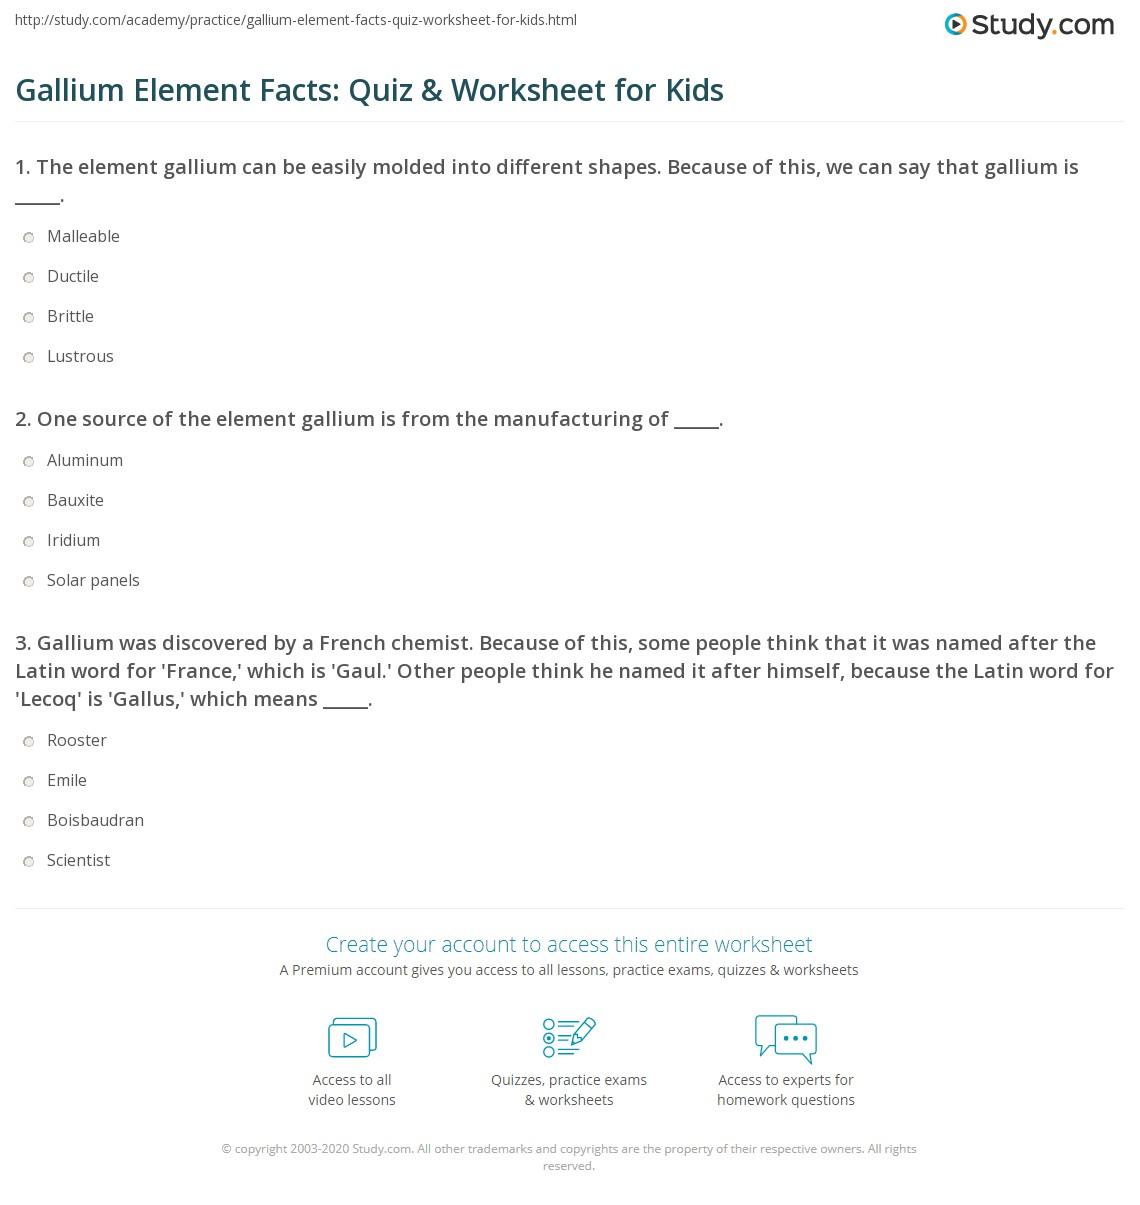 Gallium Element Facts Quiz Amp Worksheet For Kids